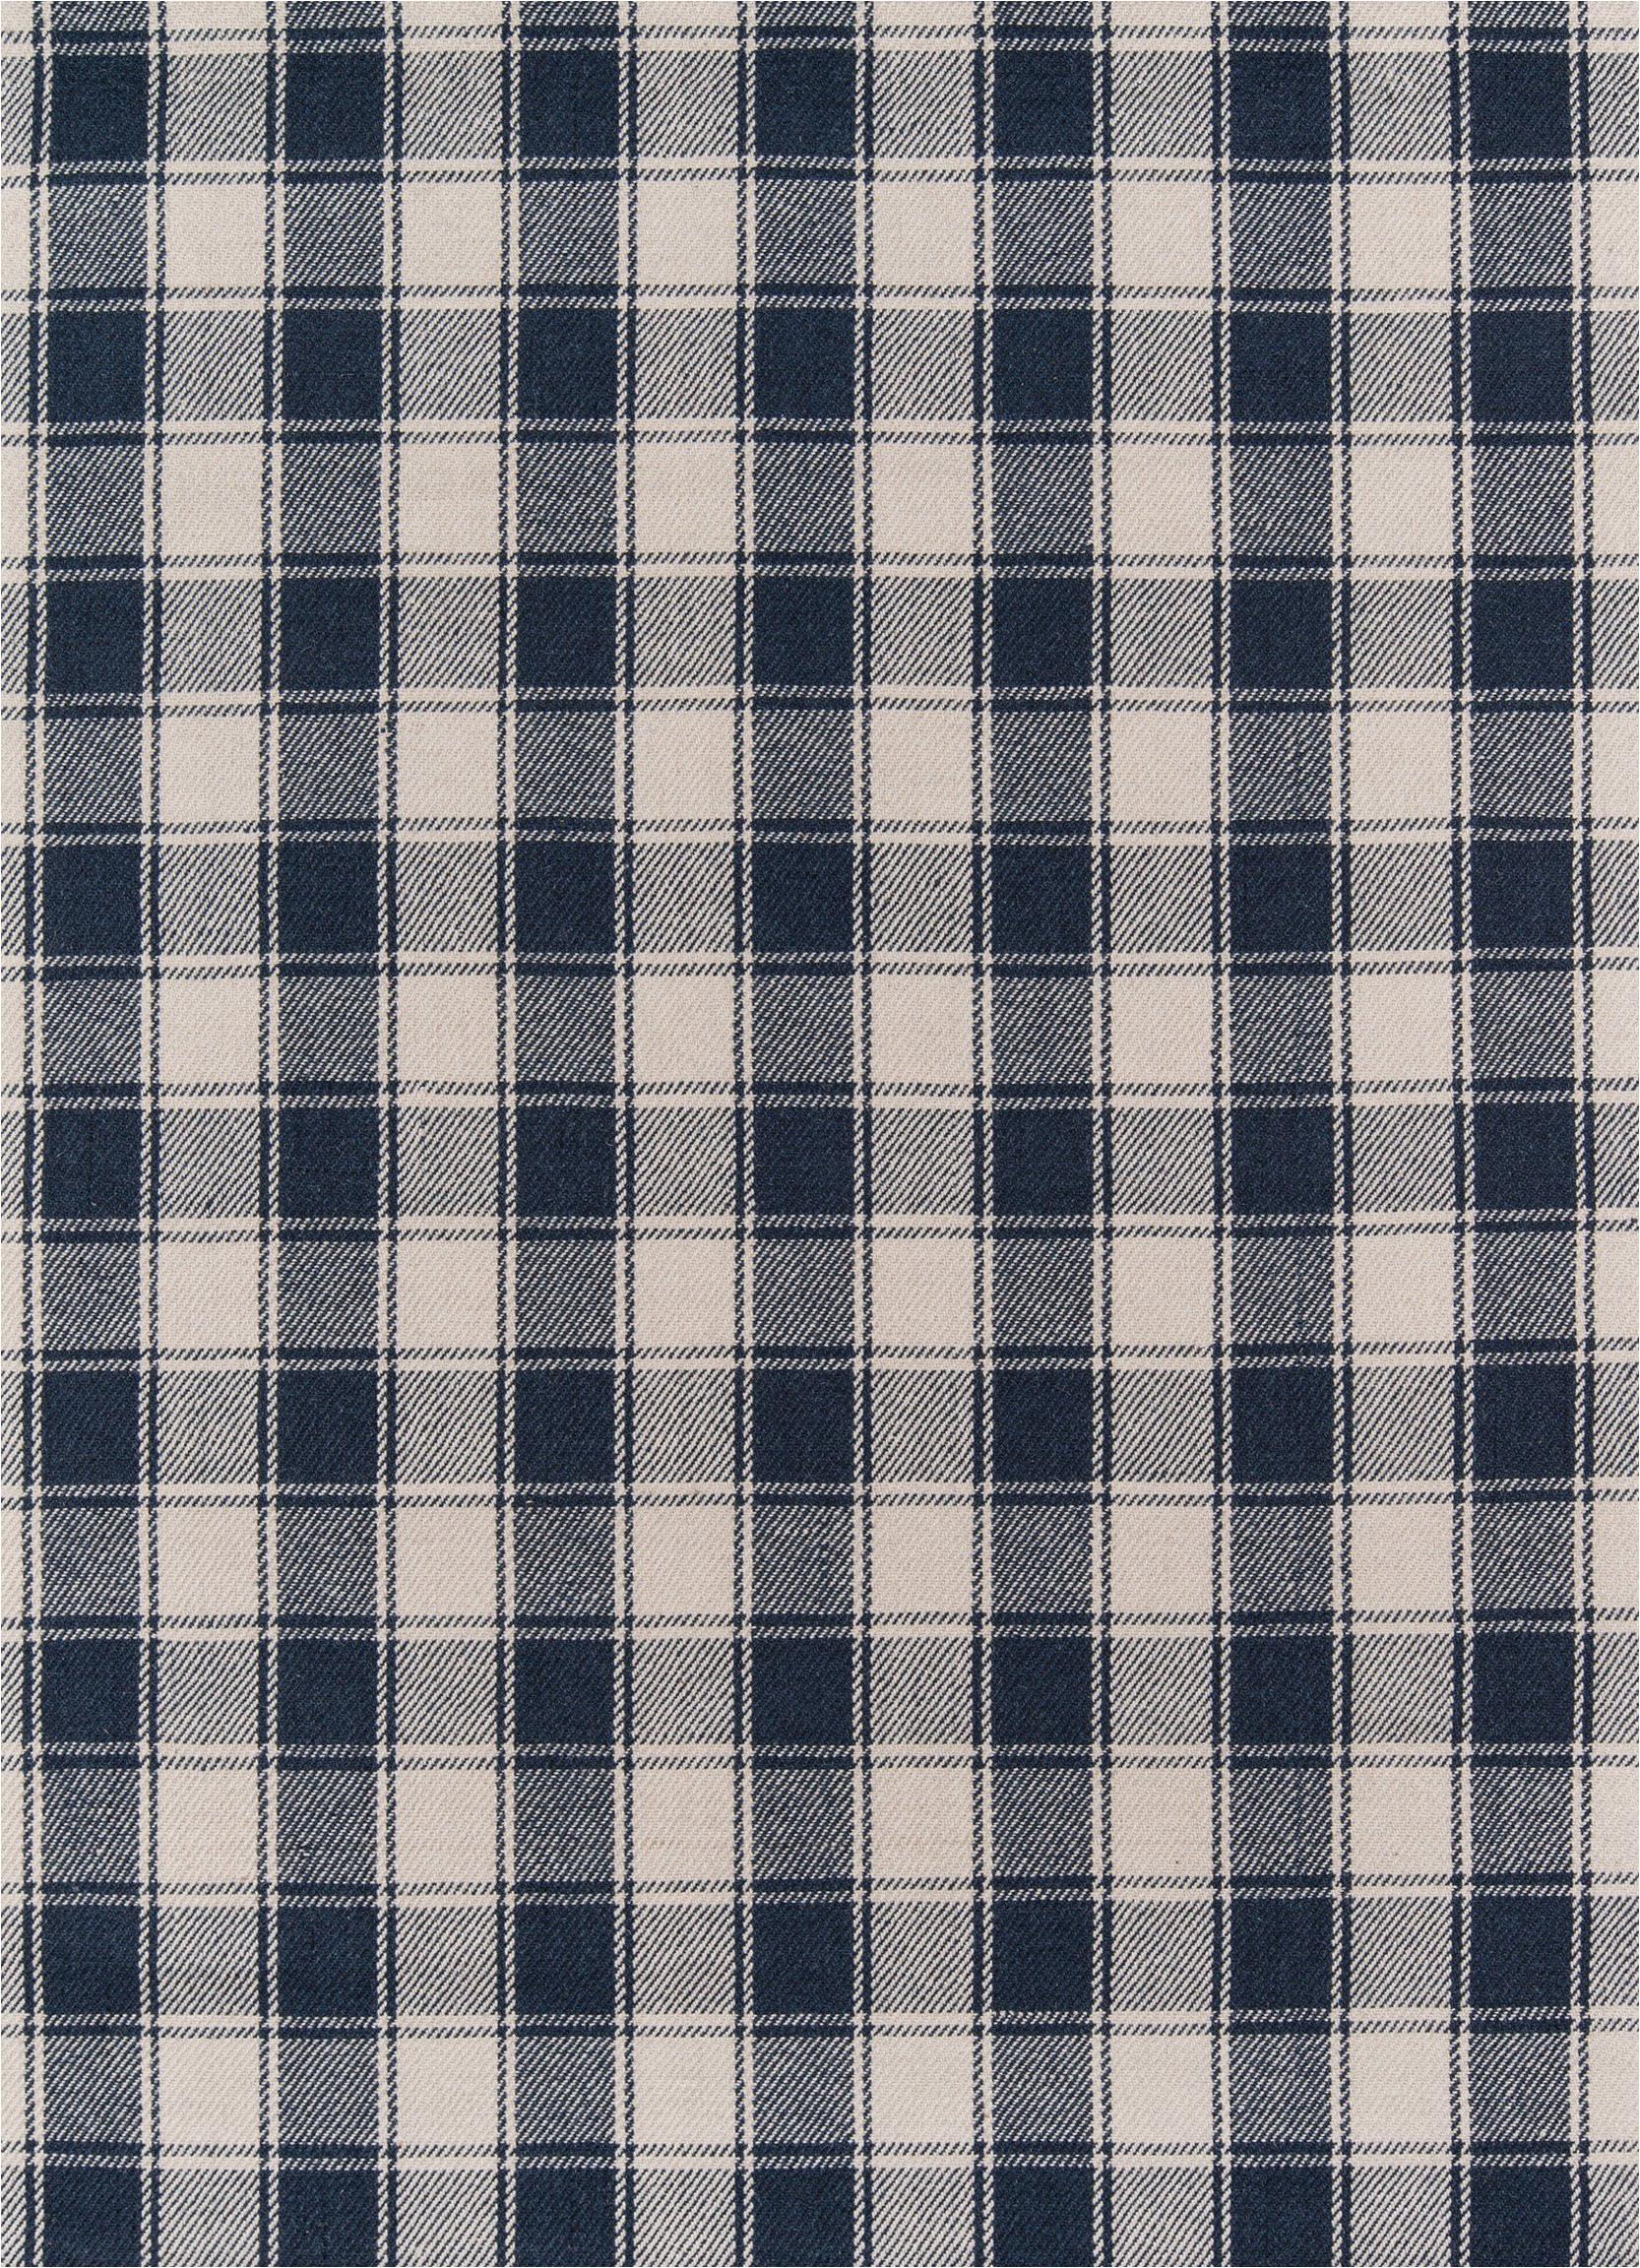 navy blue plaid tartan wool rug erin gates marlborough woodwaves 2048x